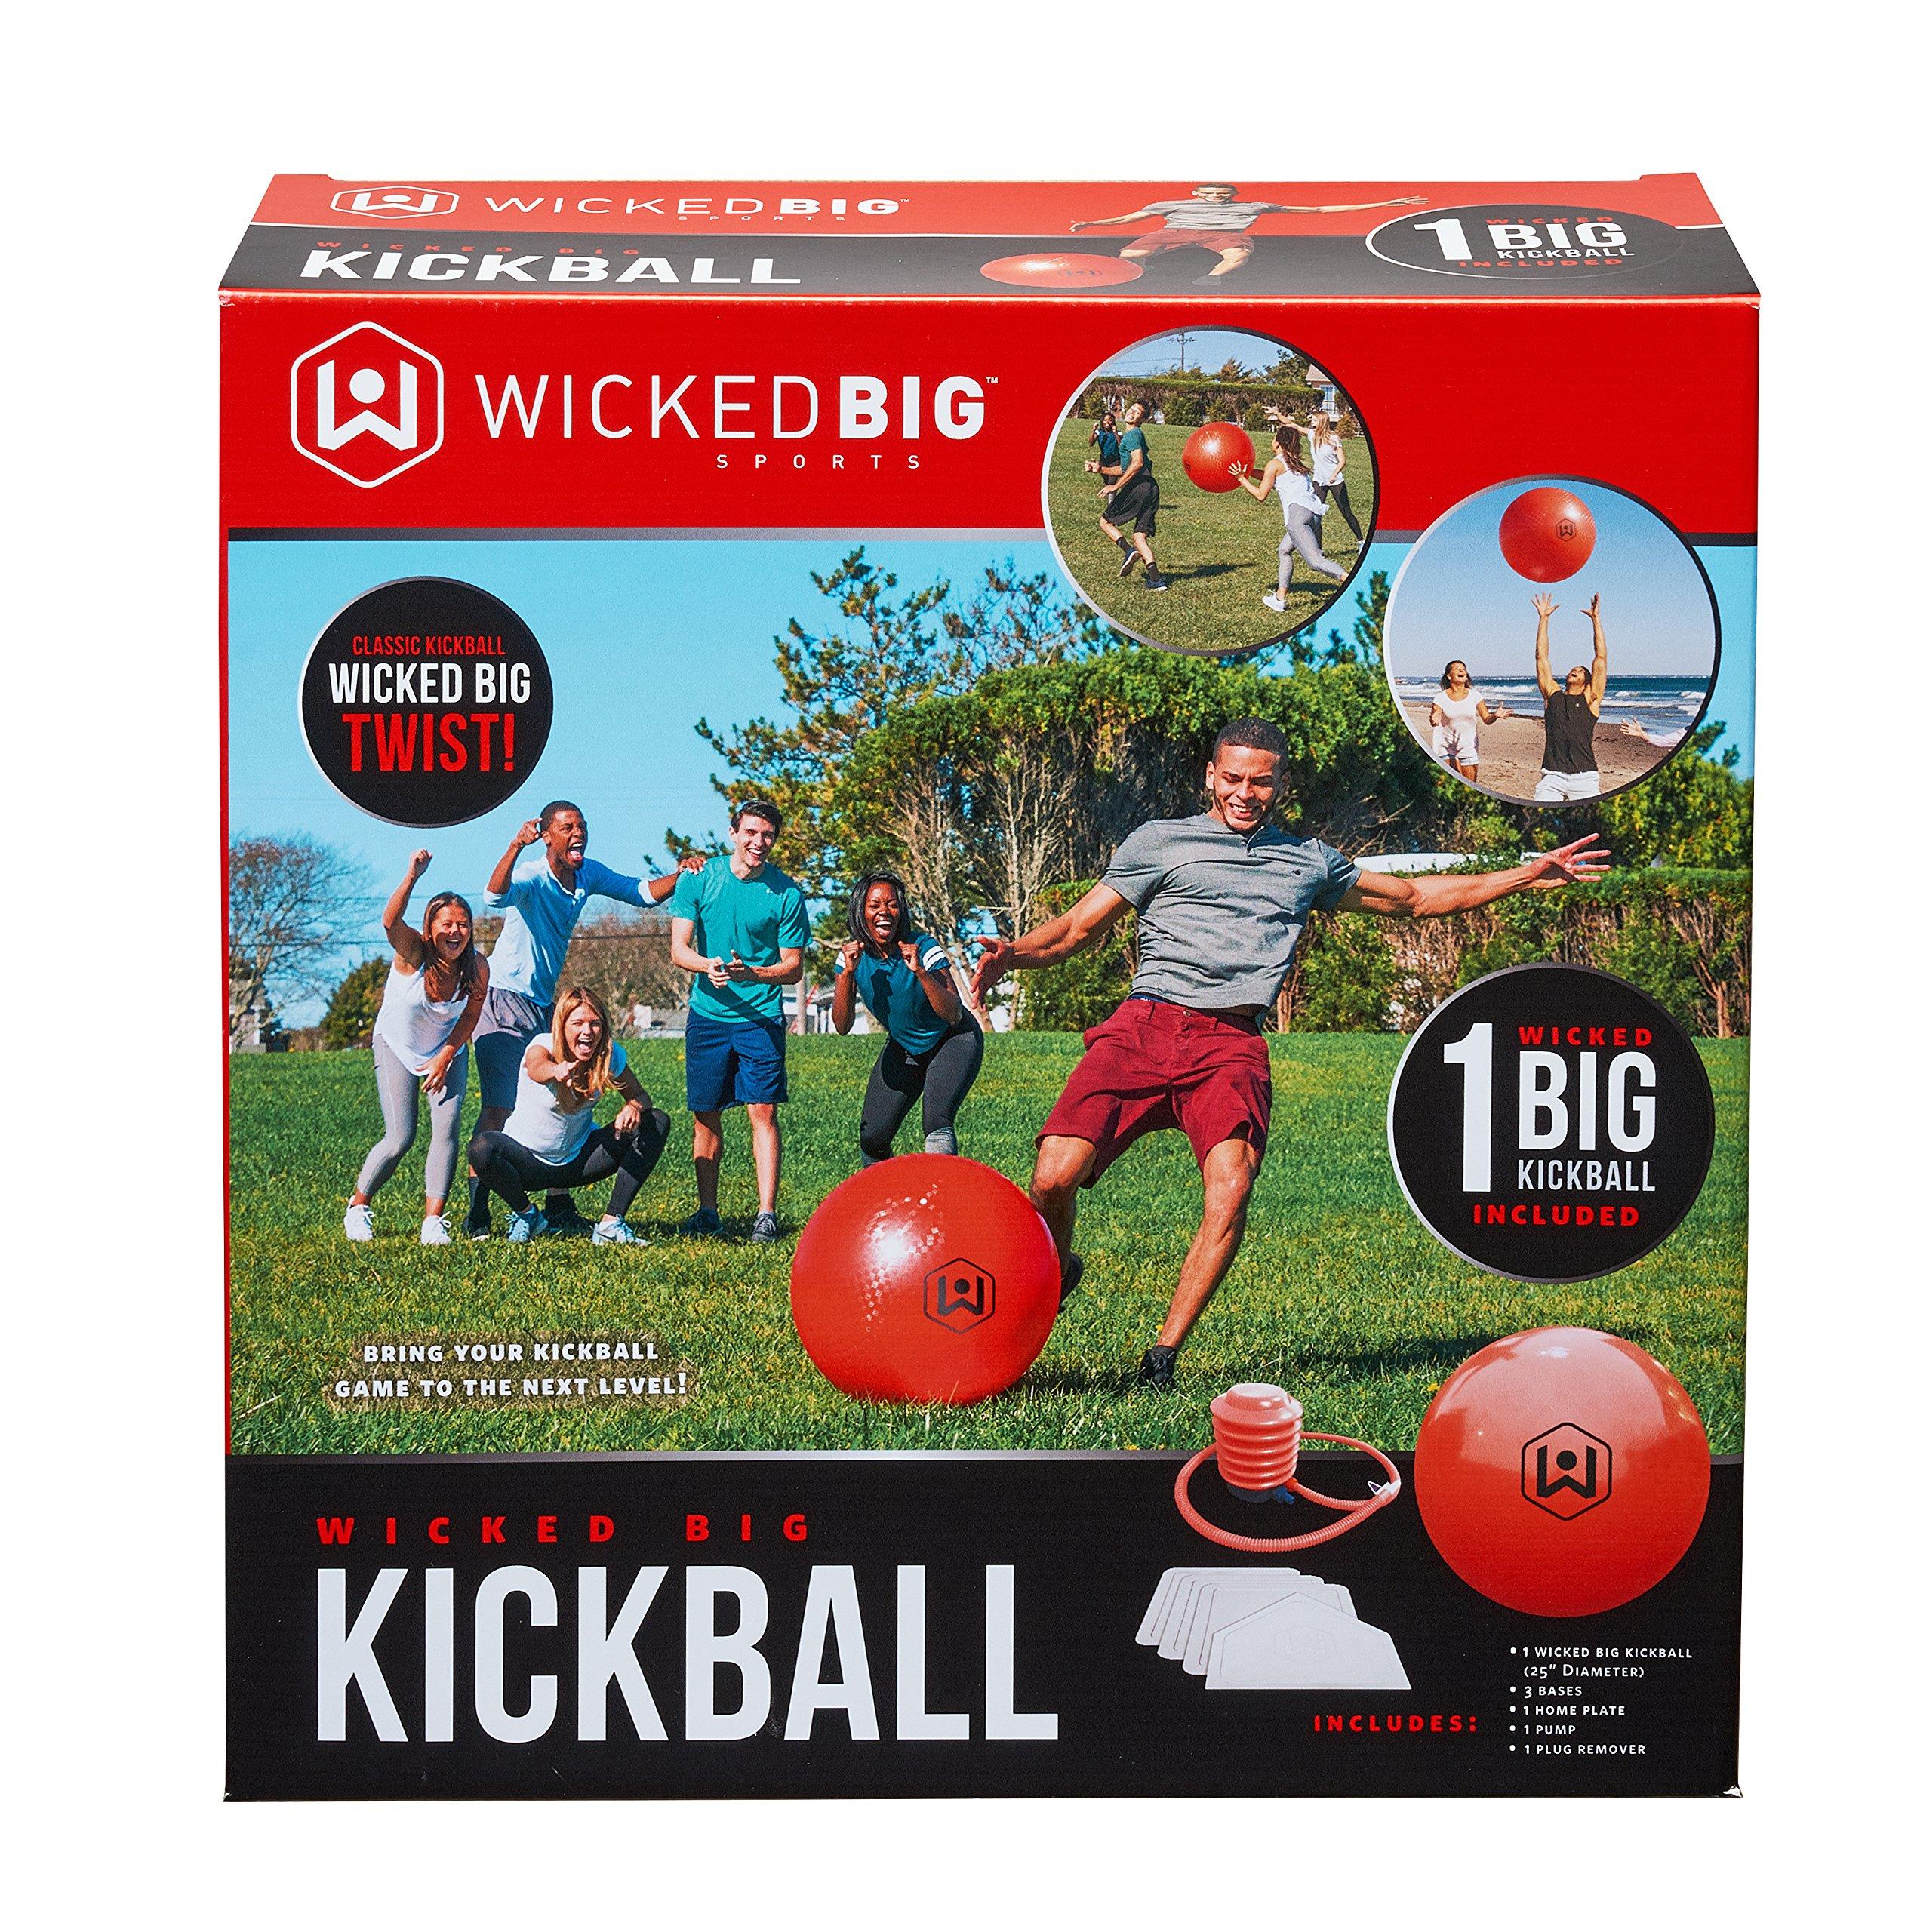 Wicked Big Sports Kickball-Supersized Kickball Outdoor Sport Tailgate Backyard Beach Game Fun for All